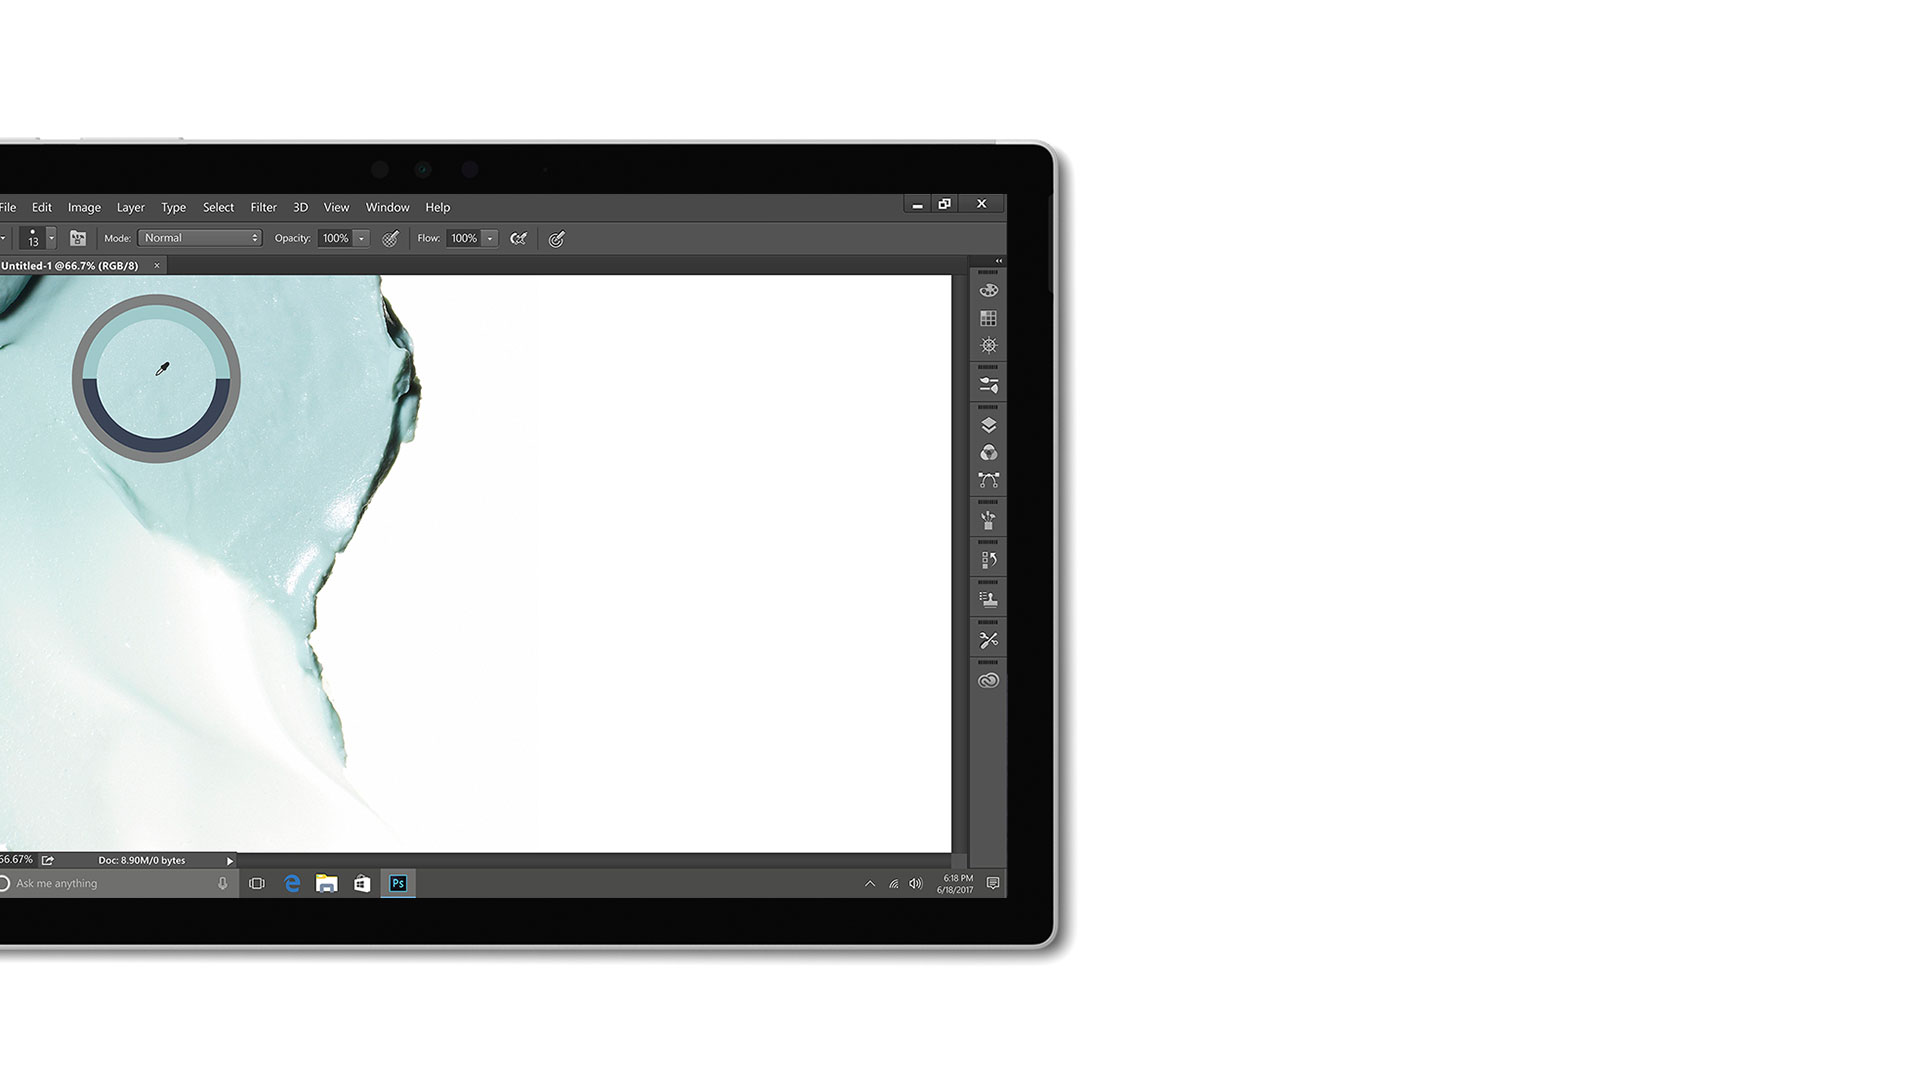 Adobe Creative Cloud 用户界面的图像